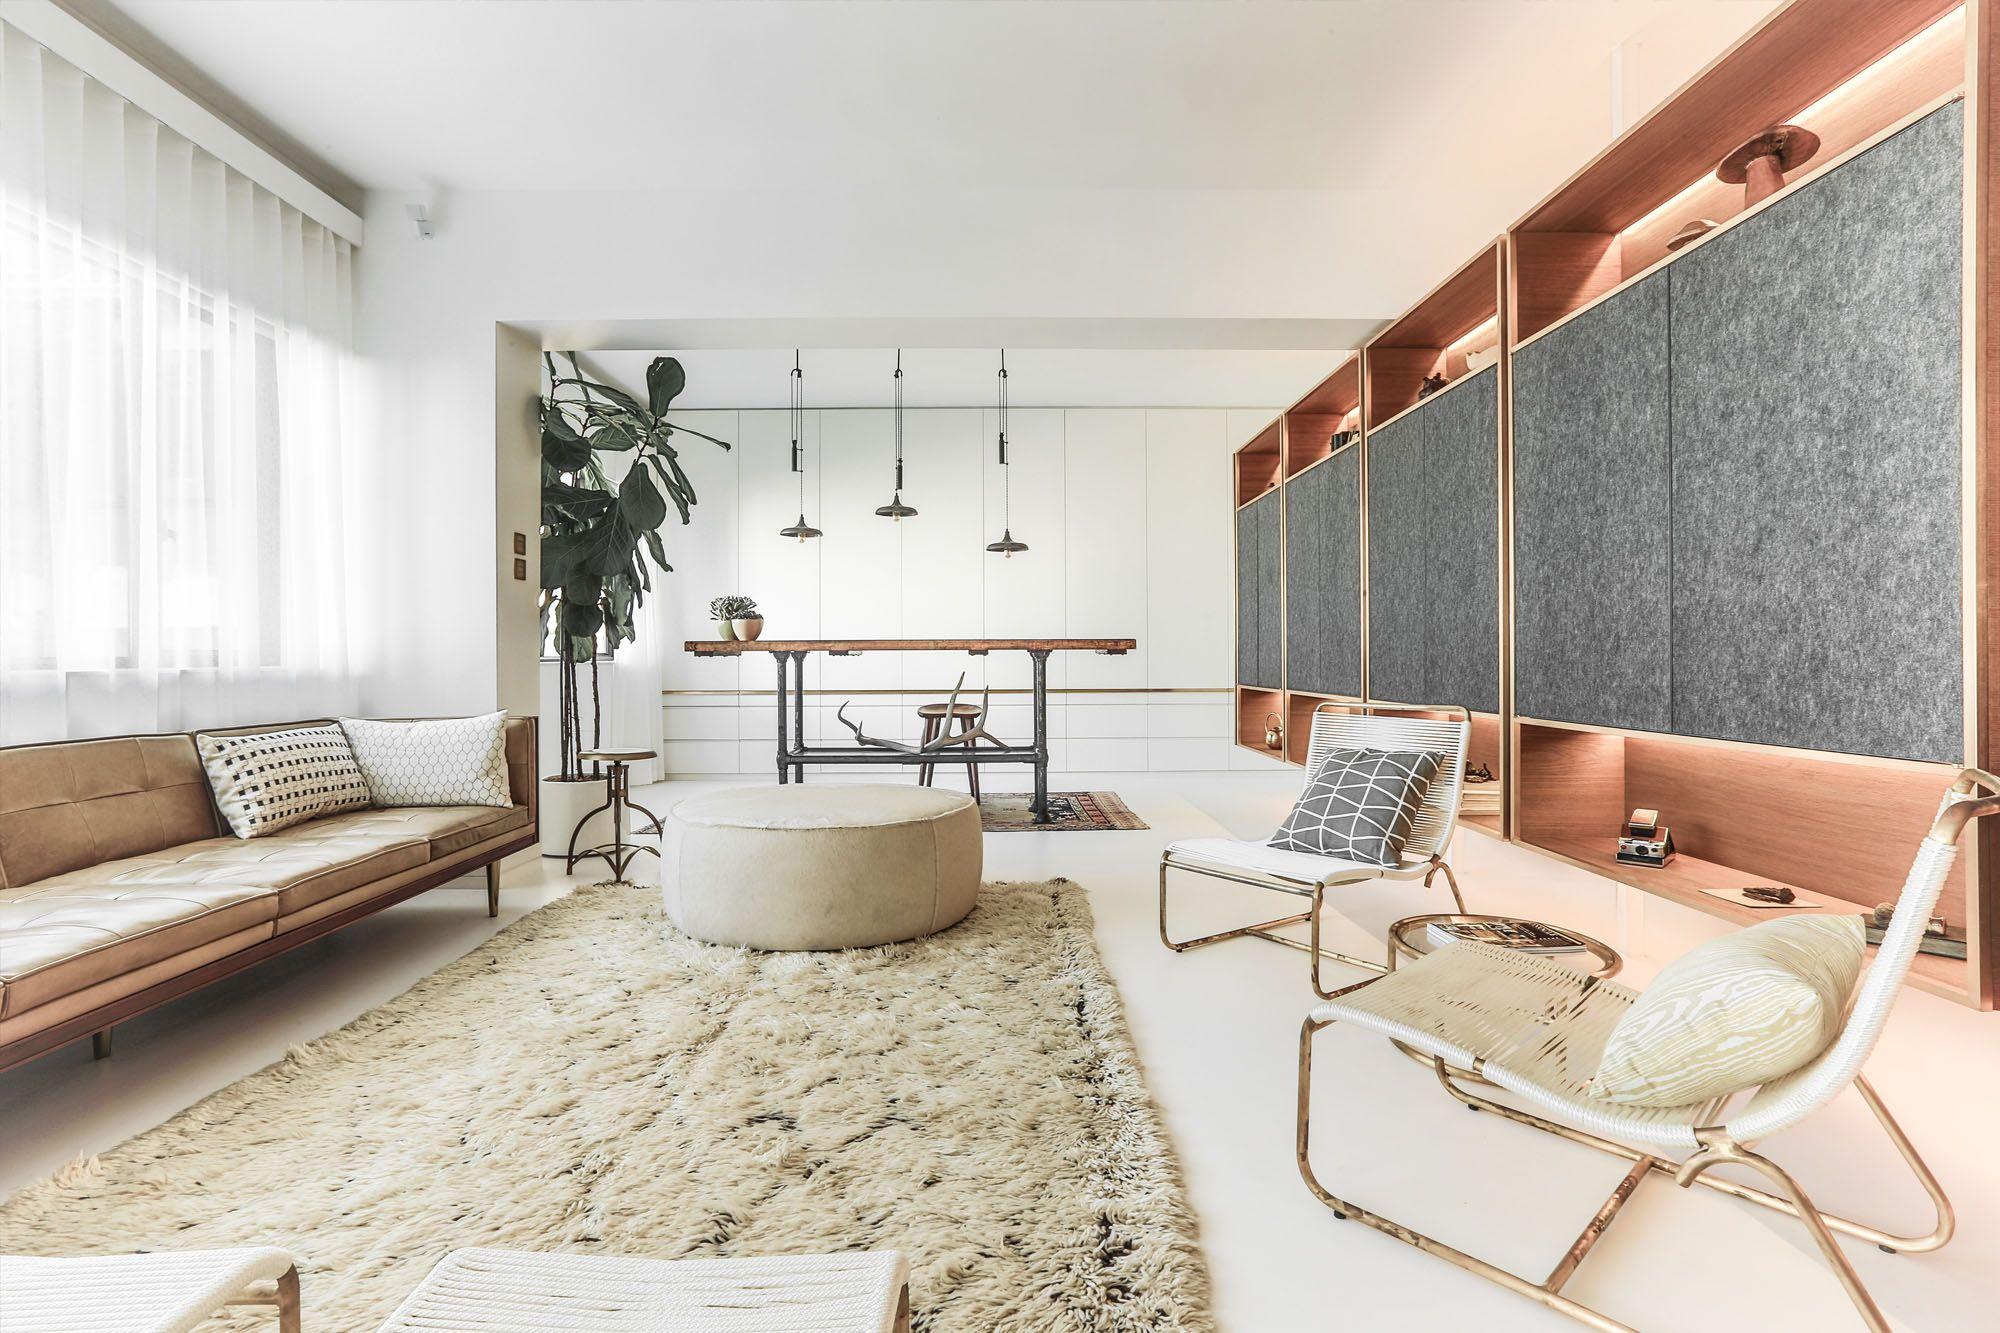 joyce wang design   House1   Pinterest